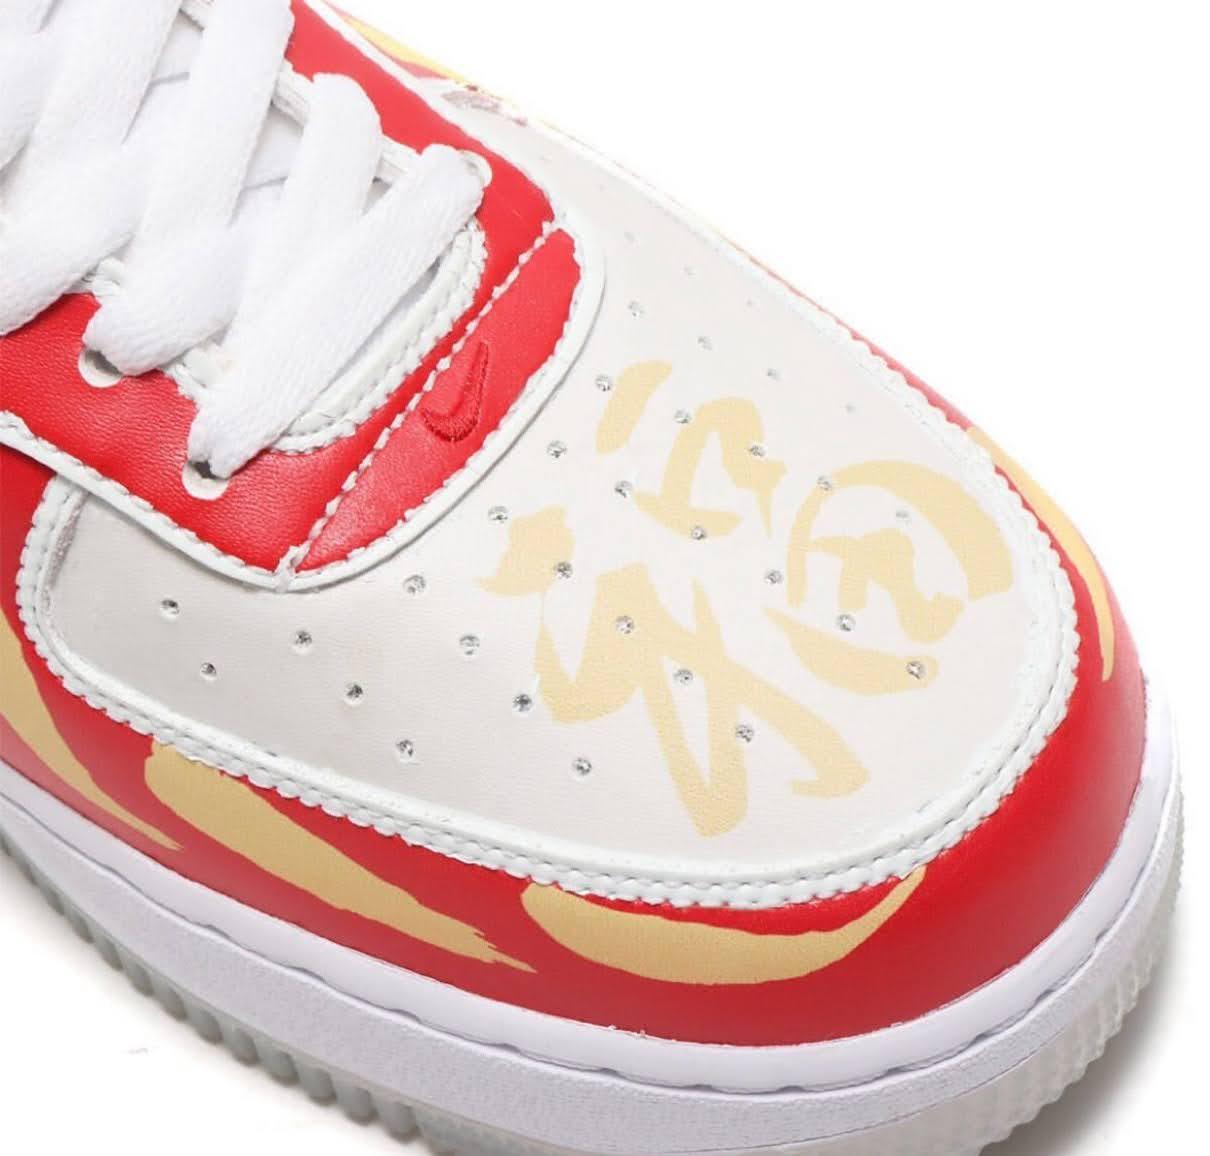 "Nike Air Force 1 Low ""I Believe DARUMA"" / ナイキ エア フォース 1 ロー ""アイ ビリーブ 達磨"" DD9941-100 detail toe"